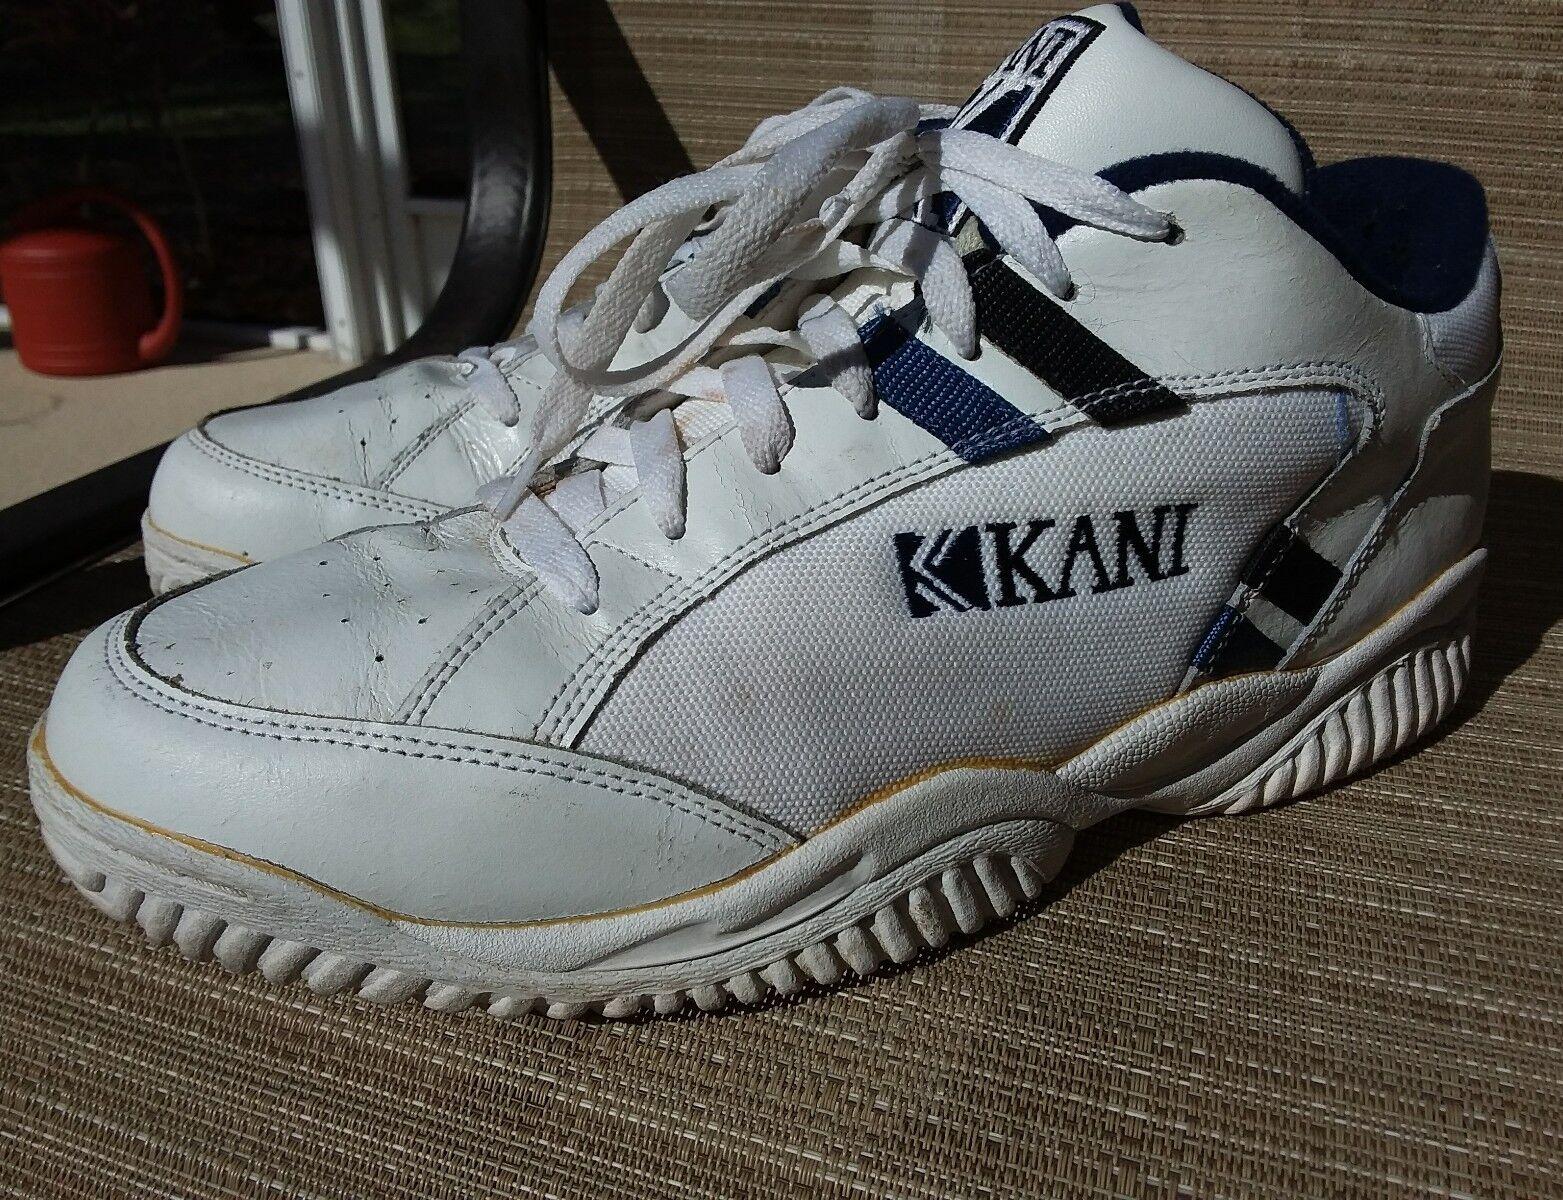 Vintage KARL KANI shoes. Canvas / / / Pelle. 2pac Tupac, Rap , Hip Hop. Size 13 86ae87